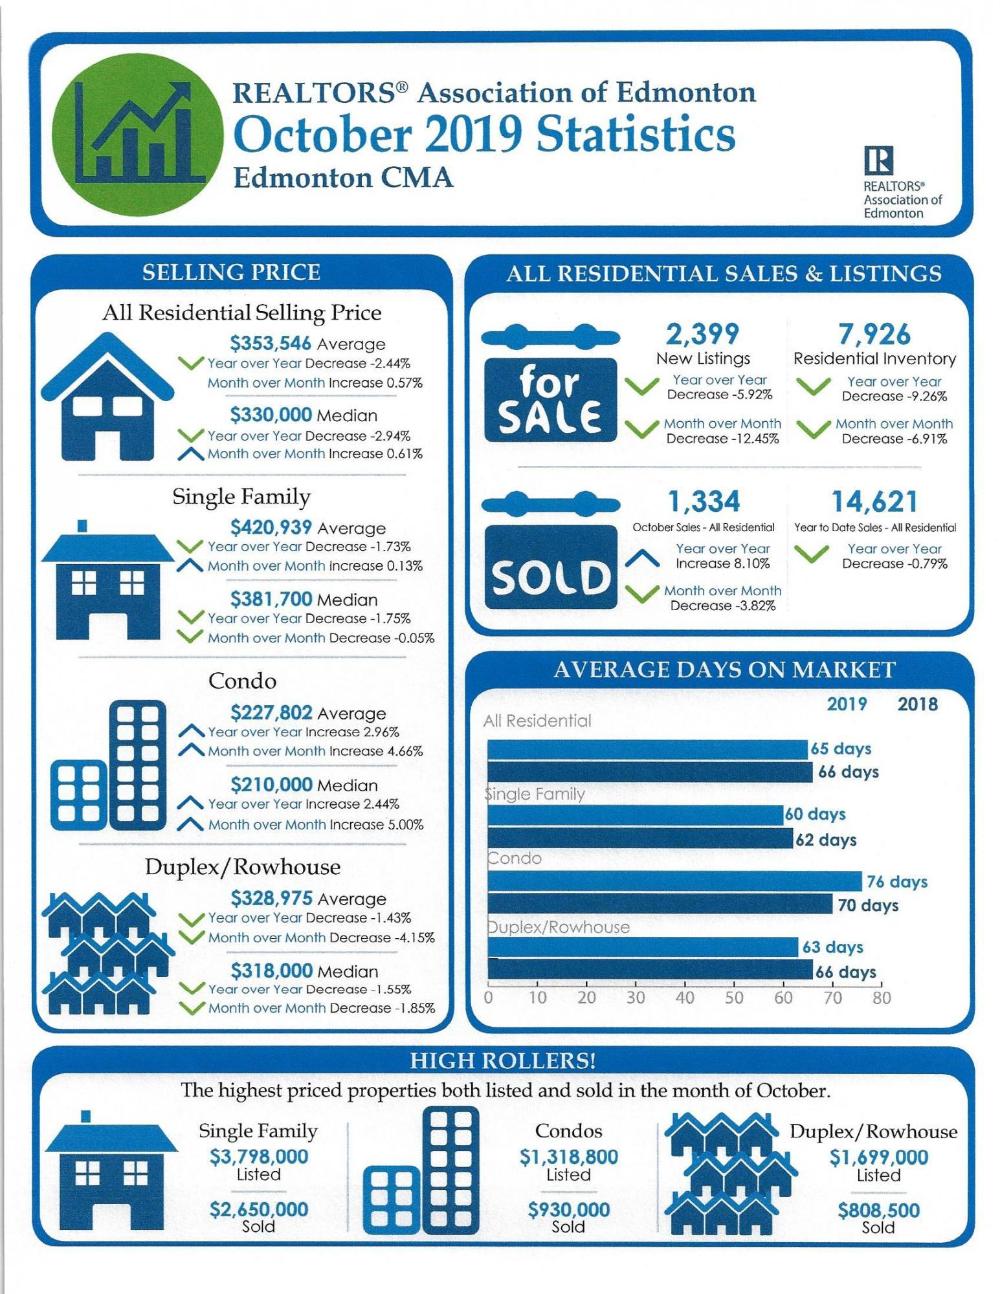 October 2019 Market Statistics for the Edmonton Area in